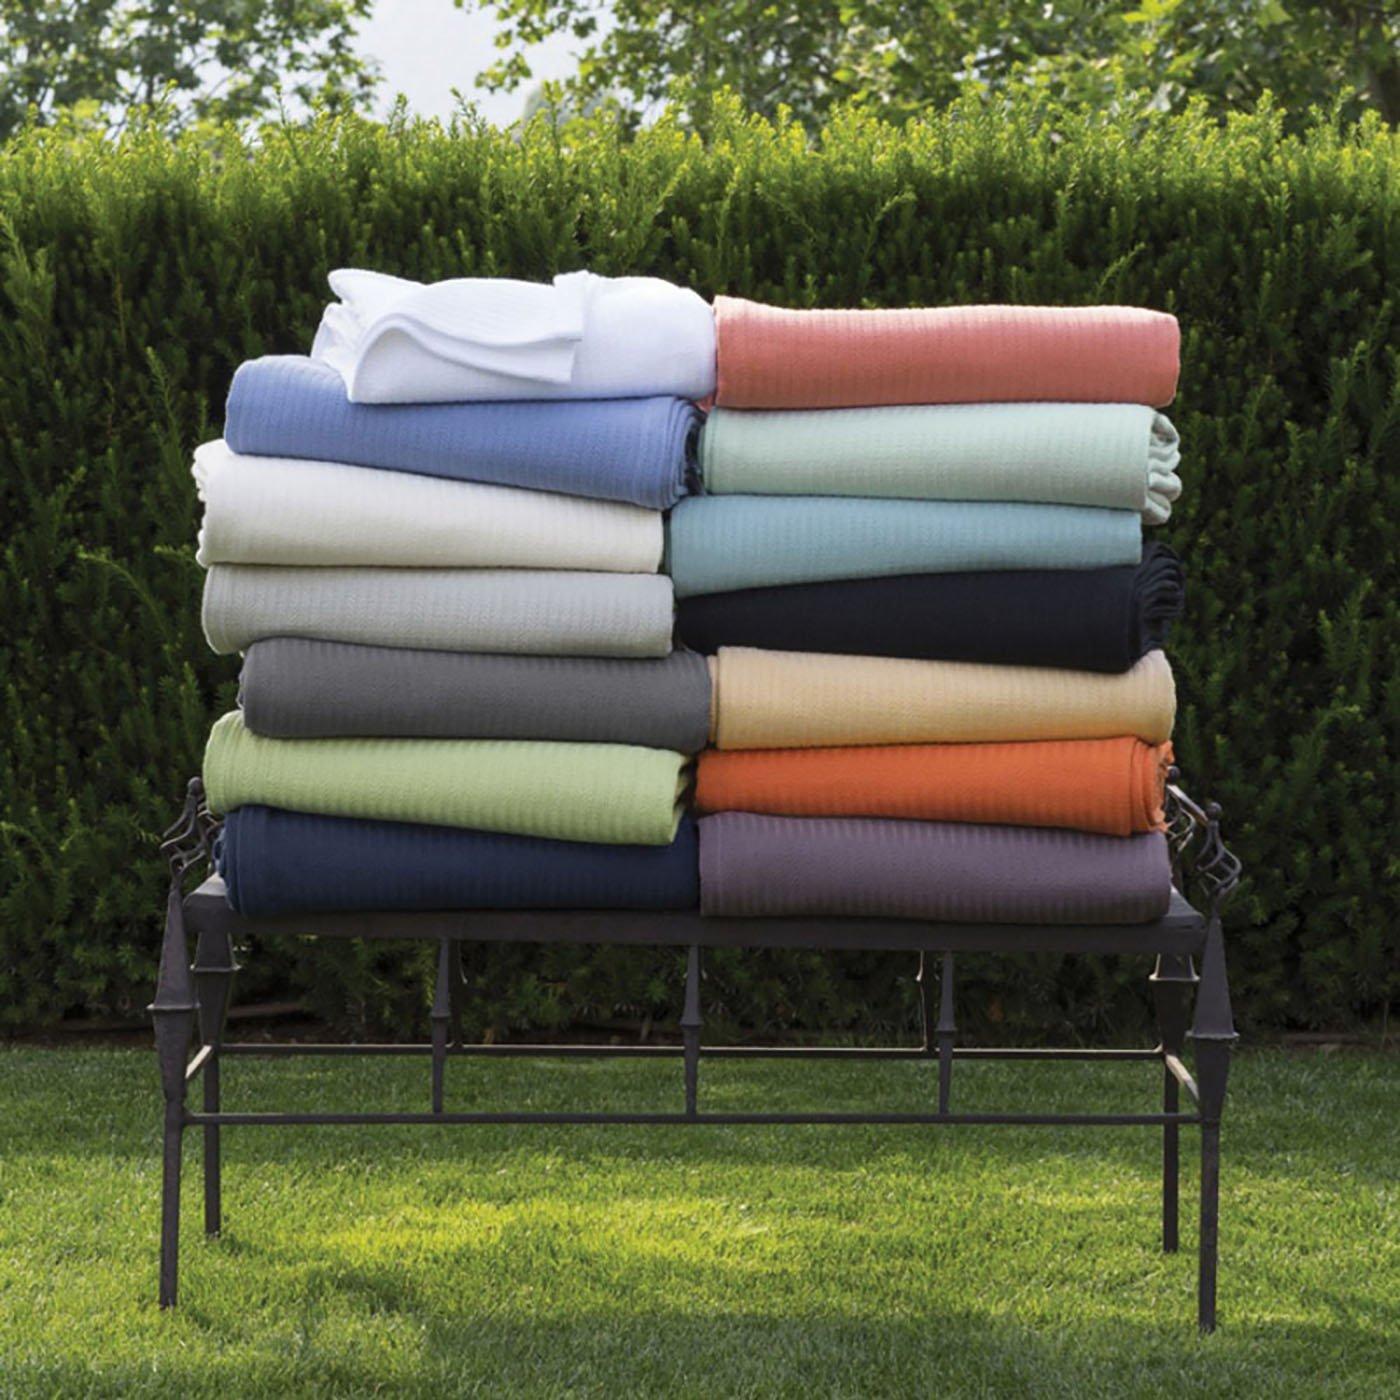 Sferra Grant Blanket King Blanket 120x100 グレー SFE2464-24063 B00EENPMWK グレー King Blanket 120x100